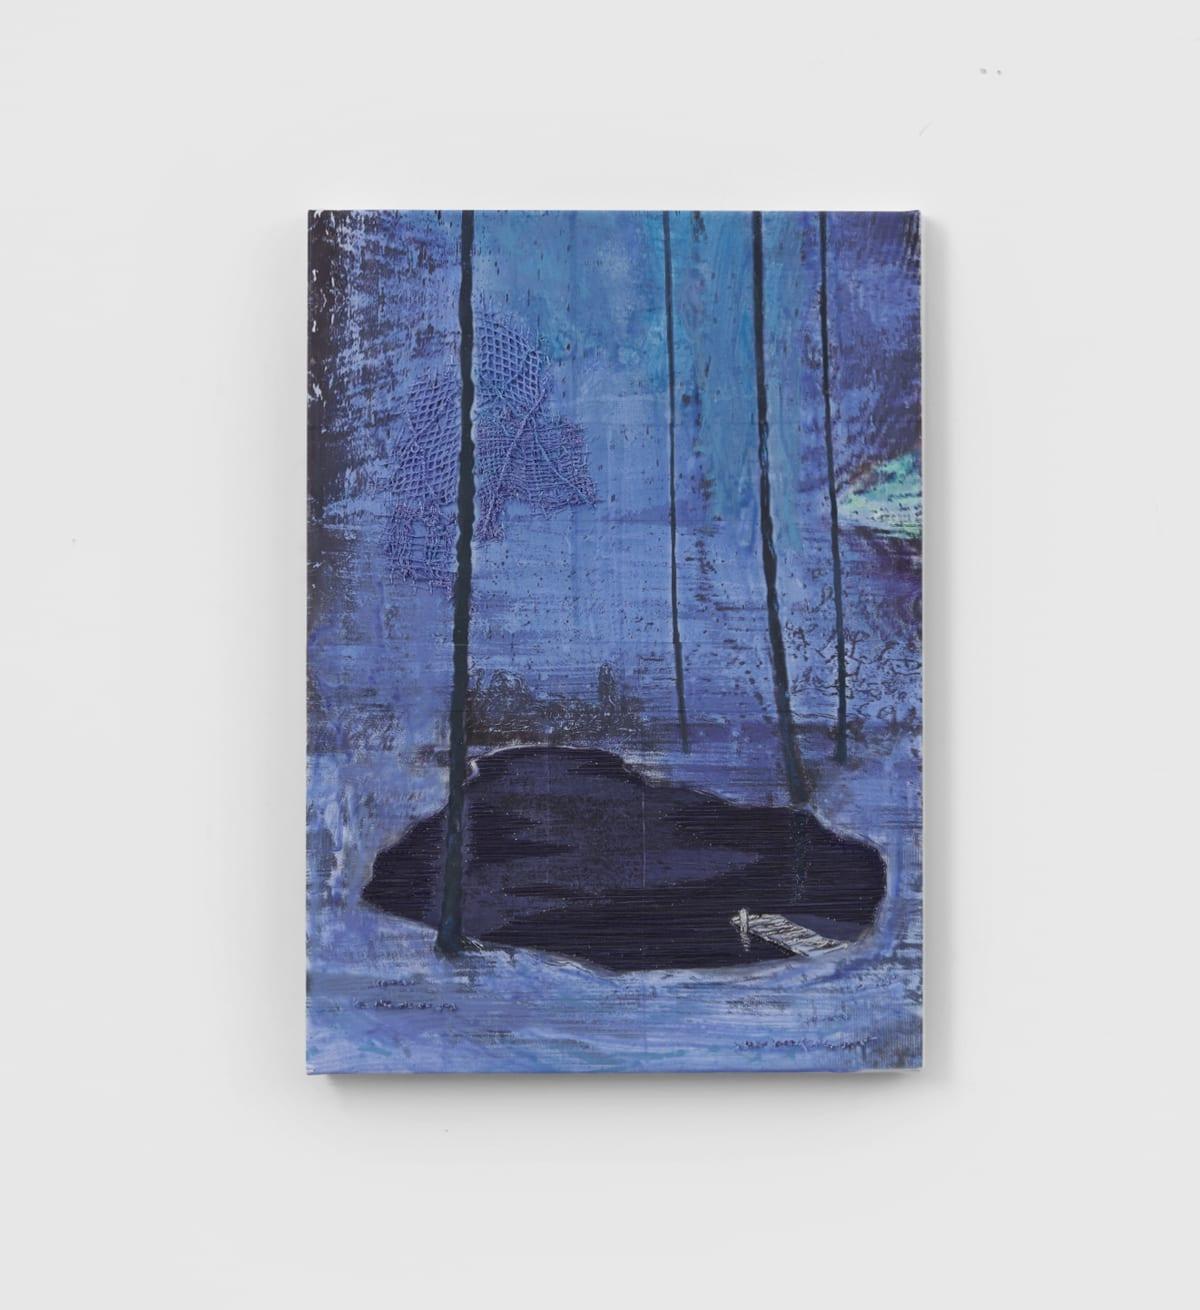 Galerie Grimm toont onheilspellende werken van Michael Raedecker (in Dutch)